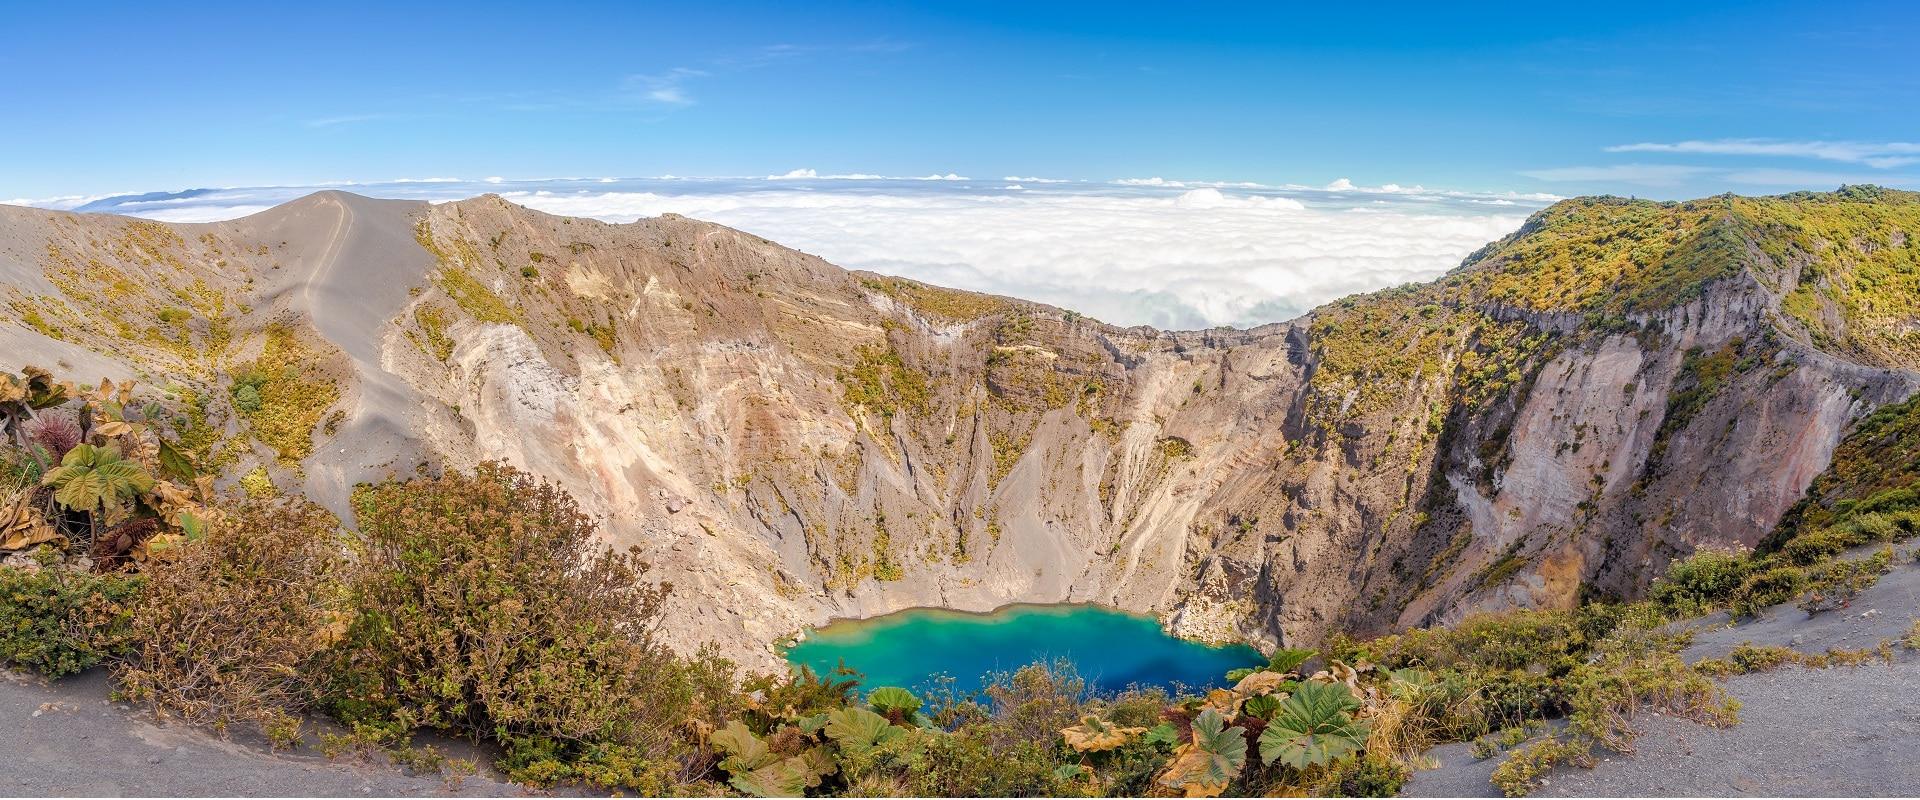 Irazu Volcano Half Day Tour Costa Rica Day Tours